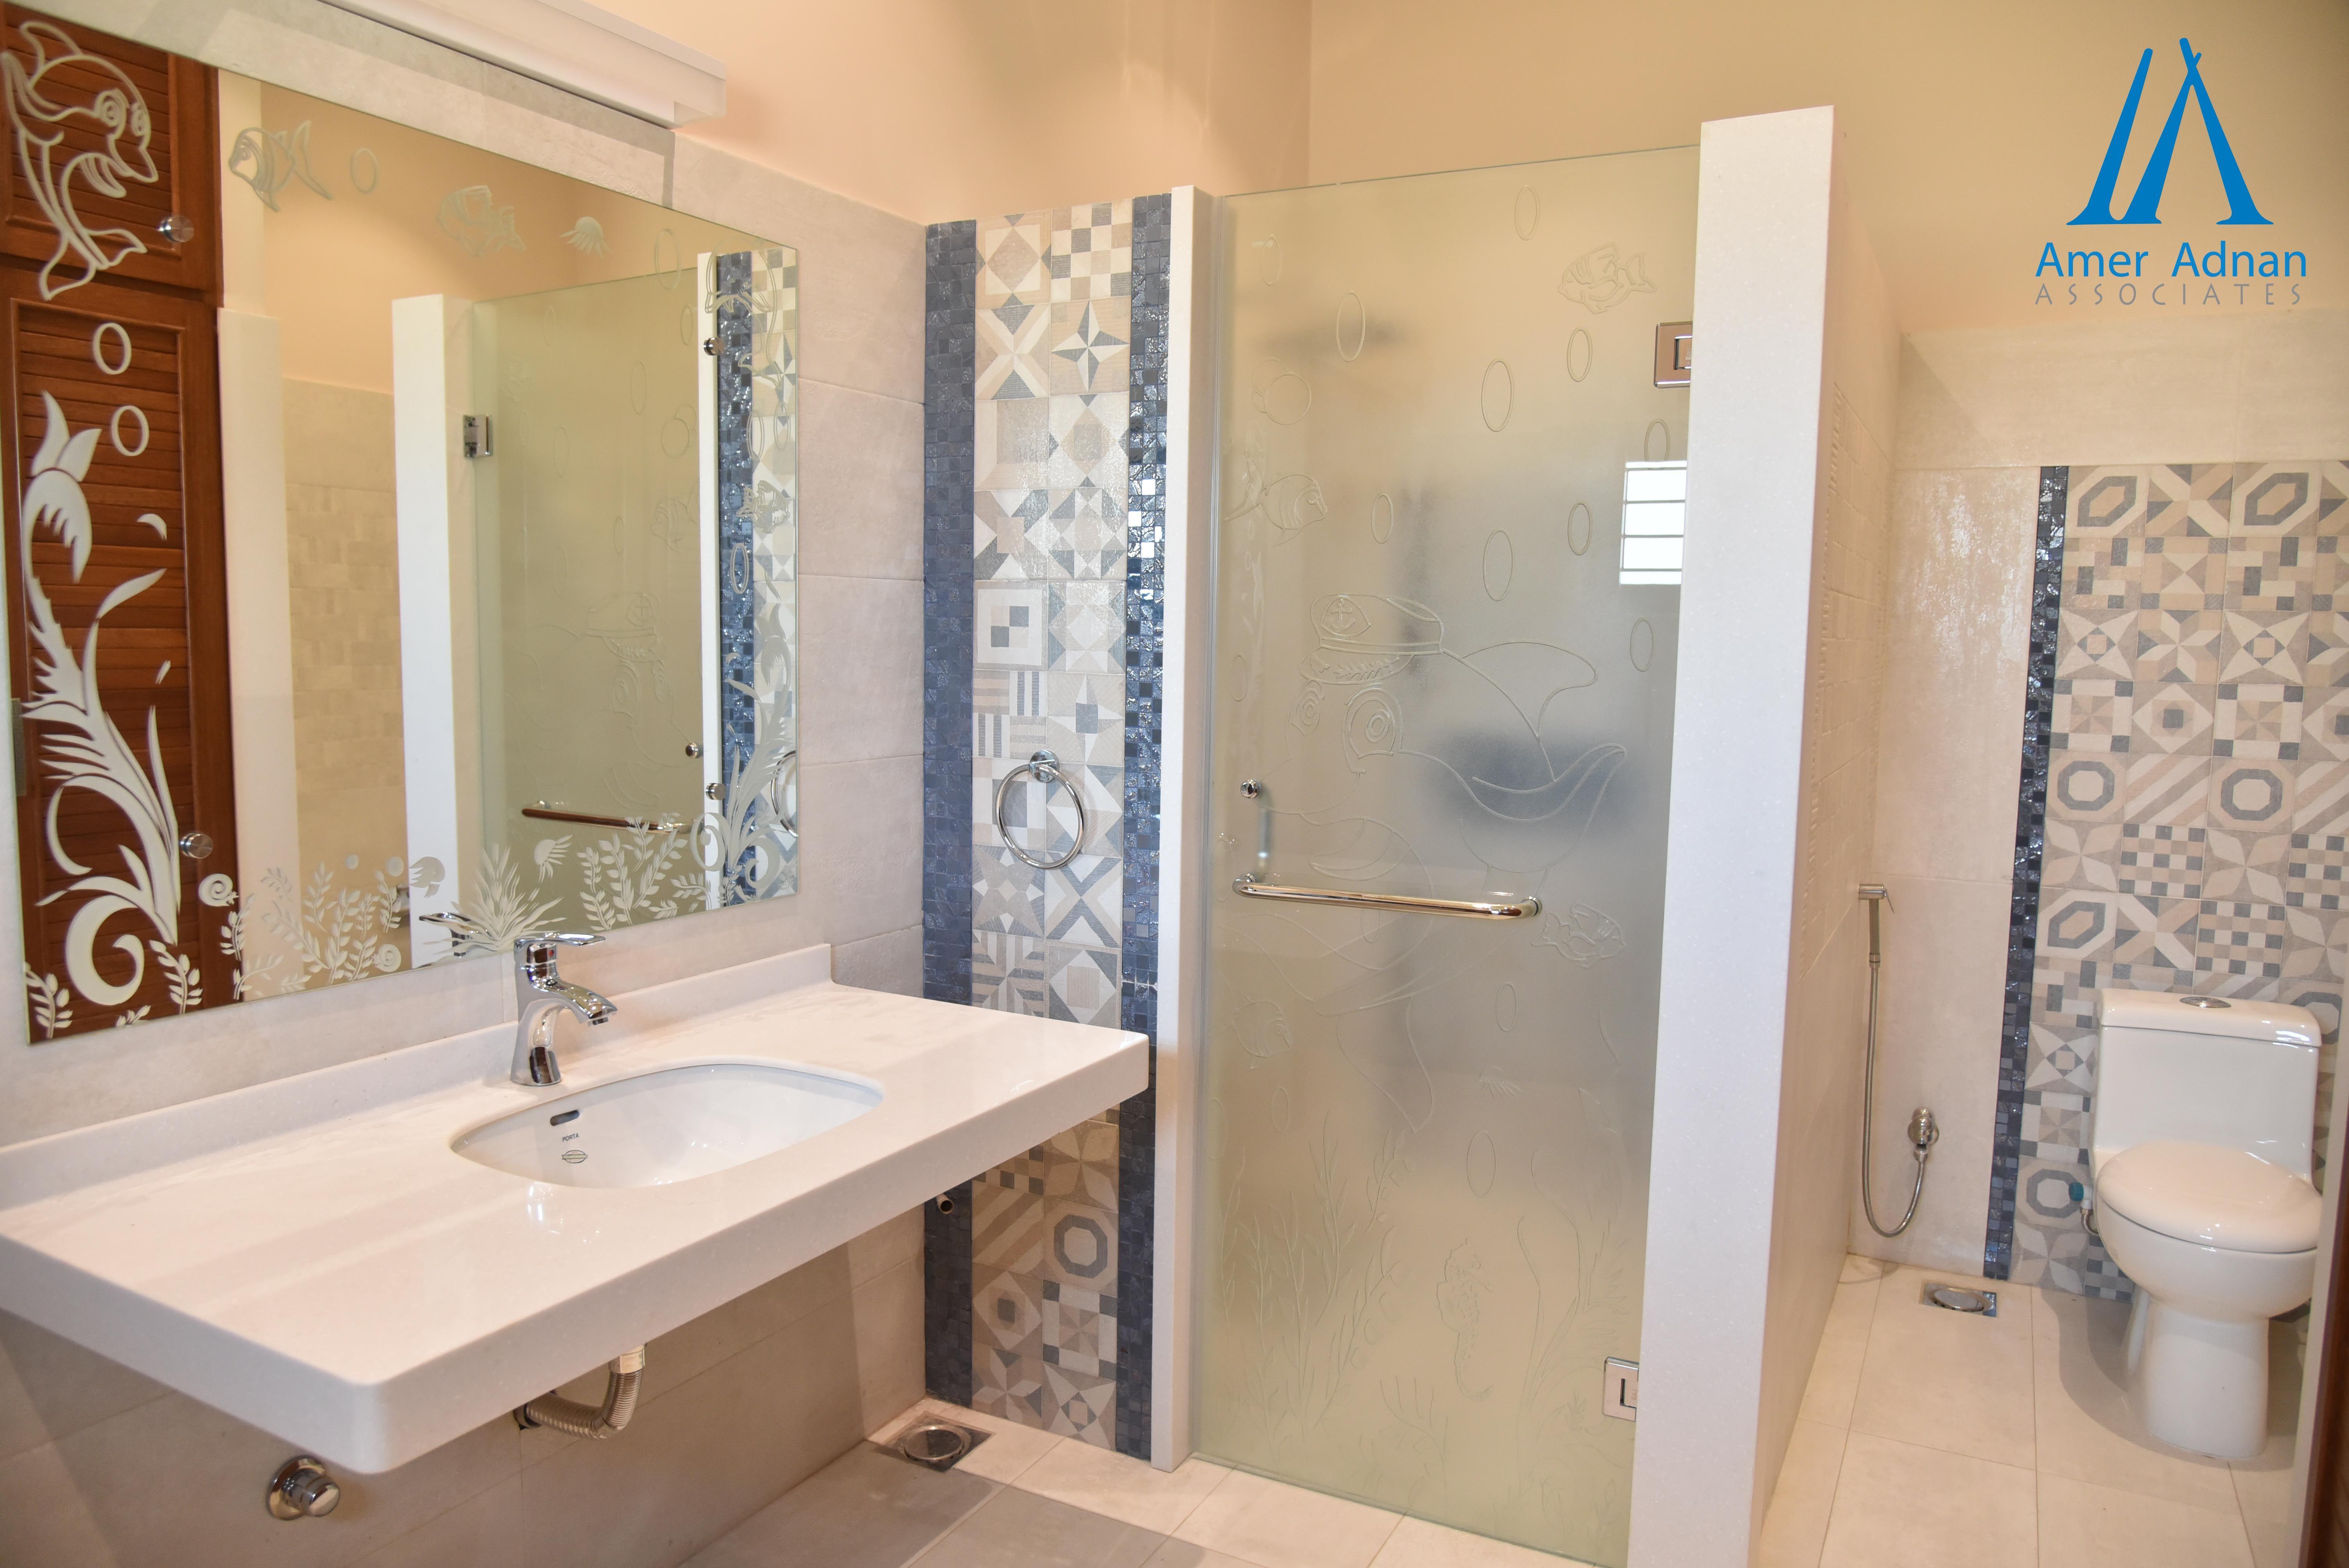 Bathroom Design Karachi modern bathroom design at its best! an example of artistic design